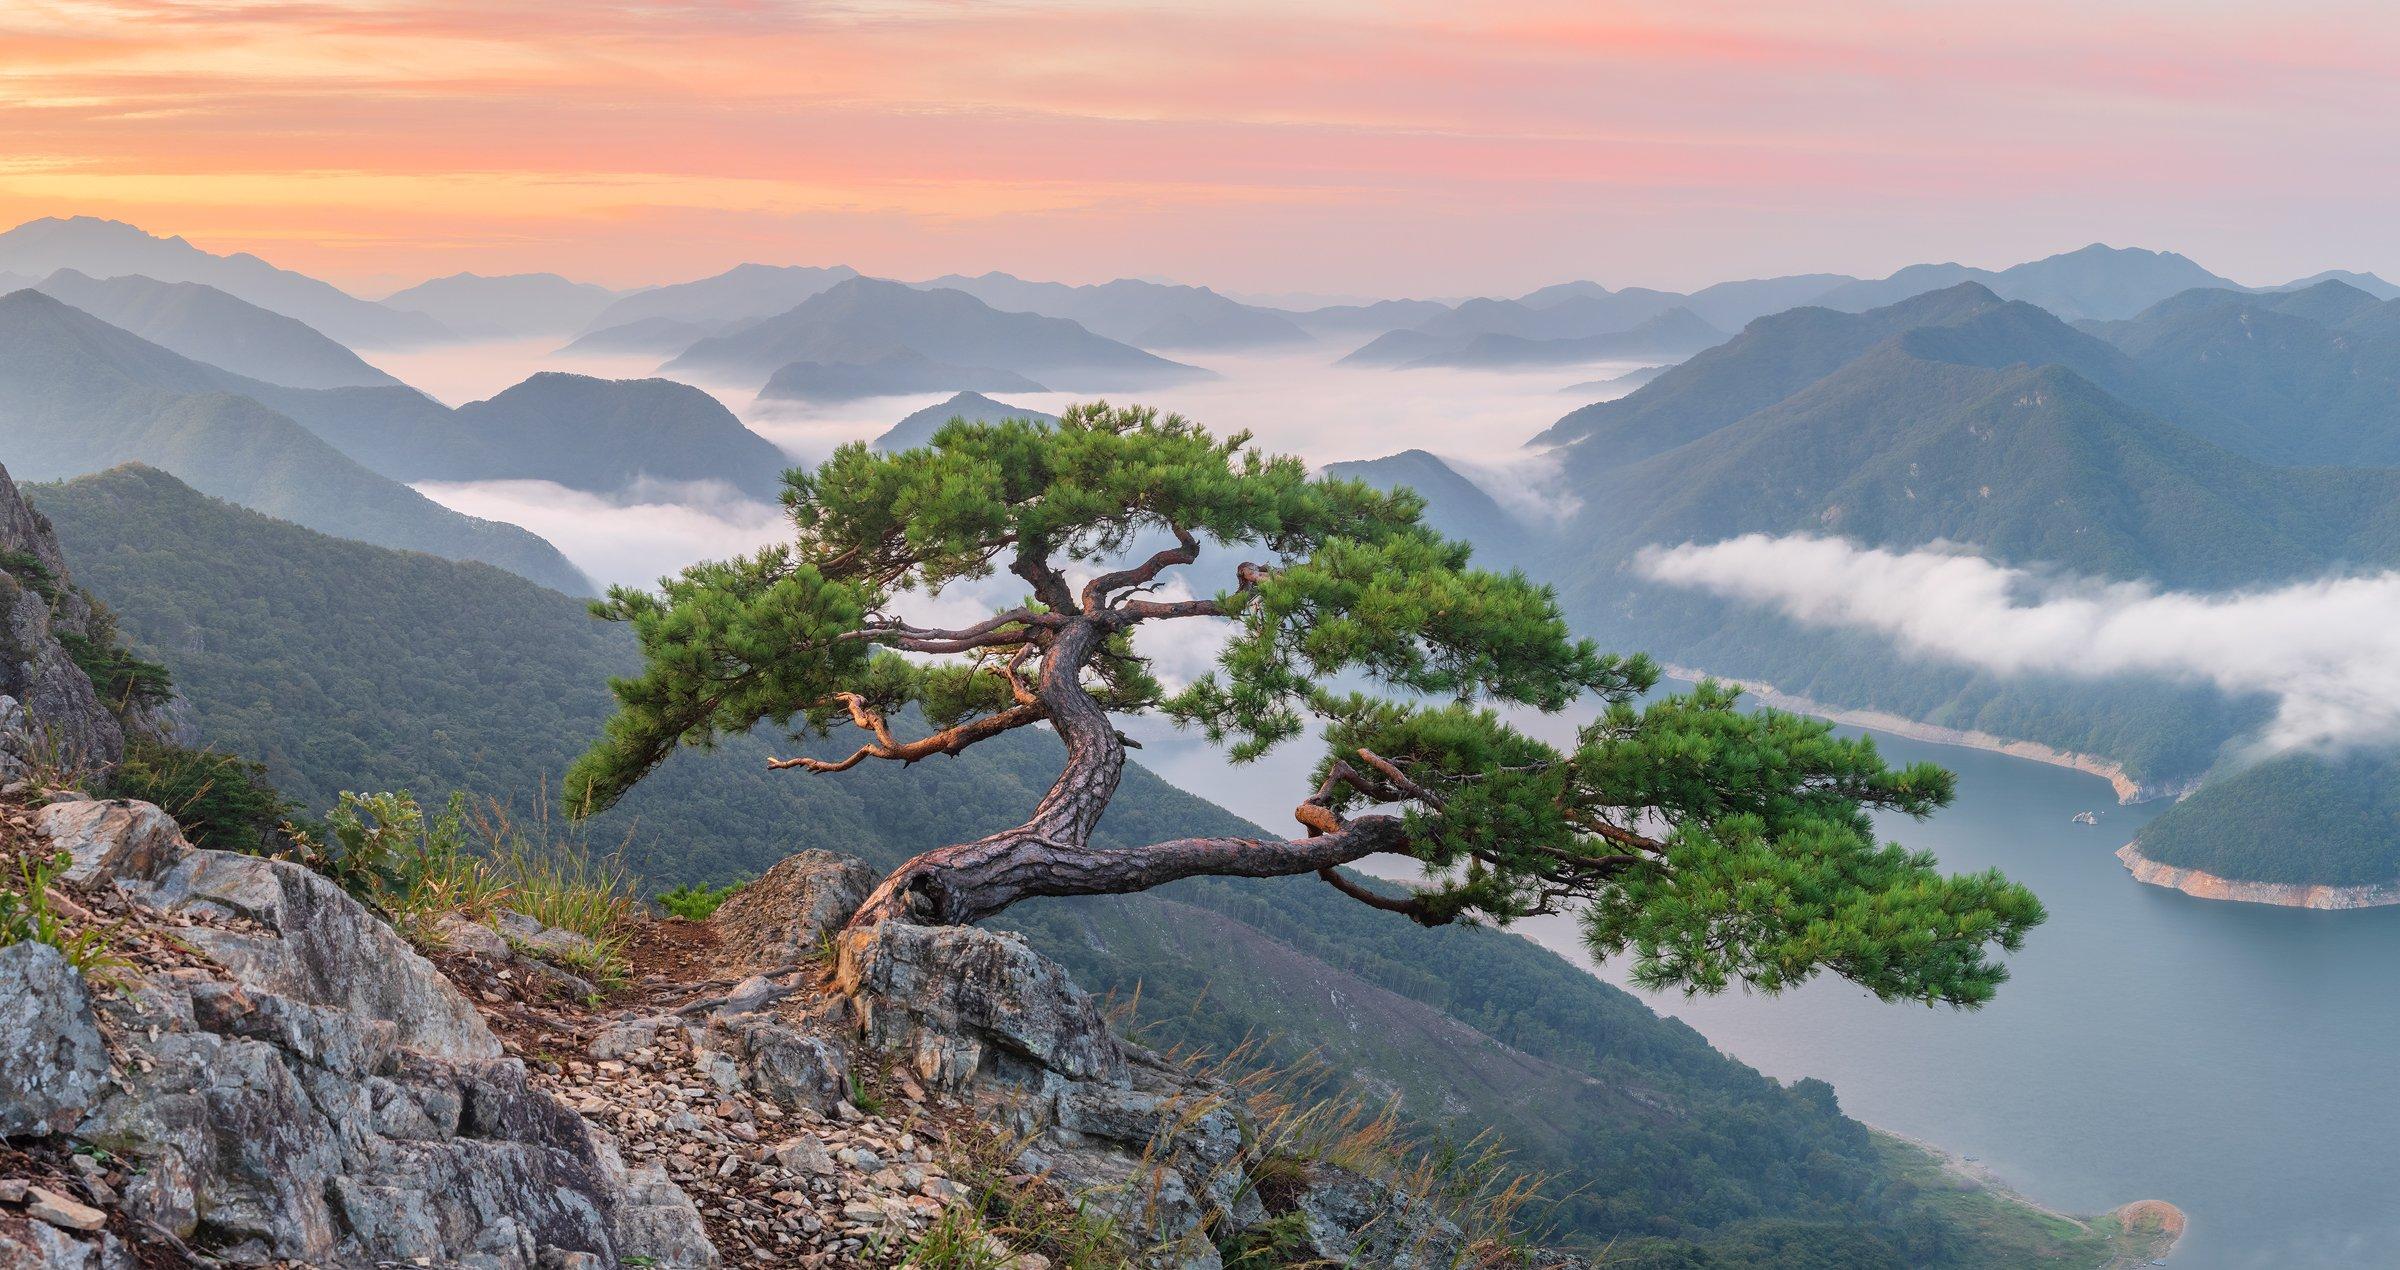 mountains,peak,hiking,fog,clouds,pine,tree,cliff, 류재윤